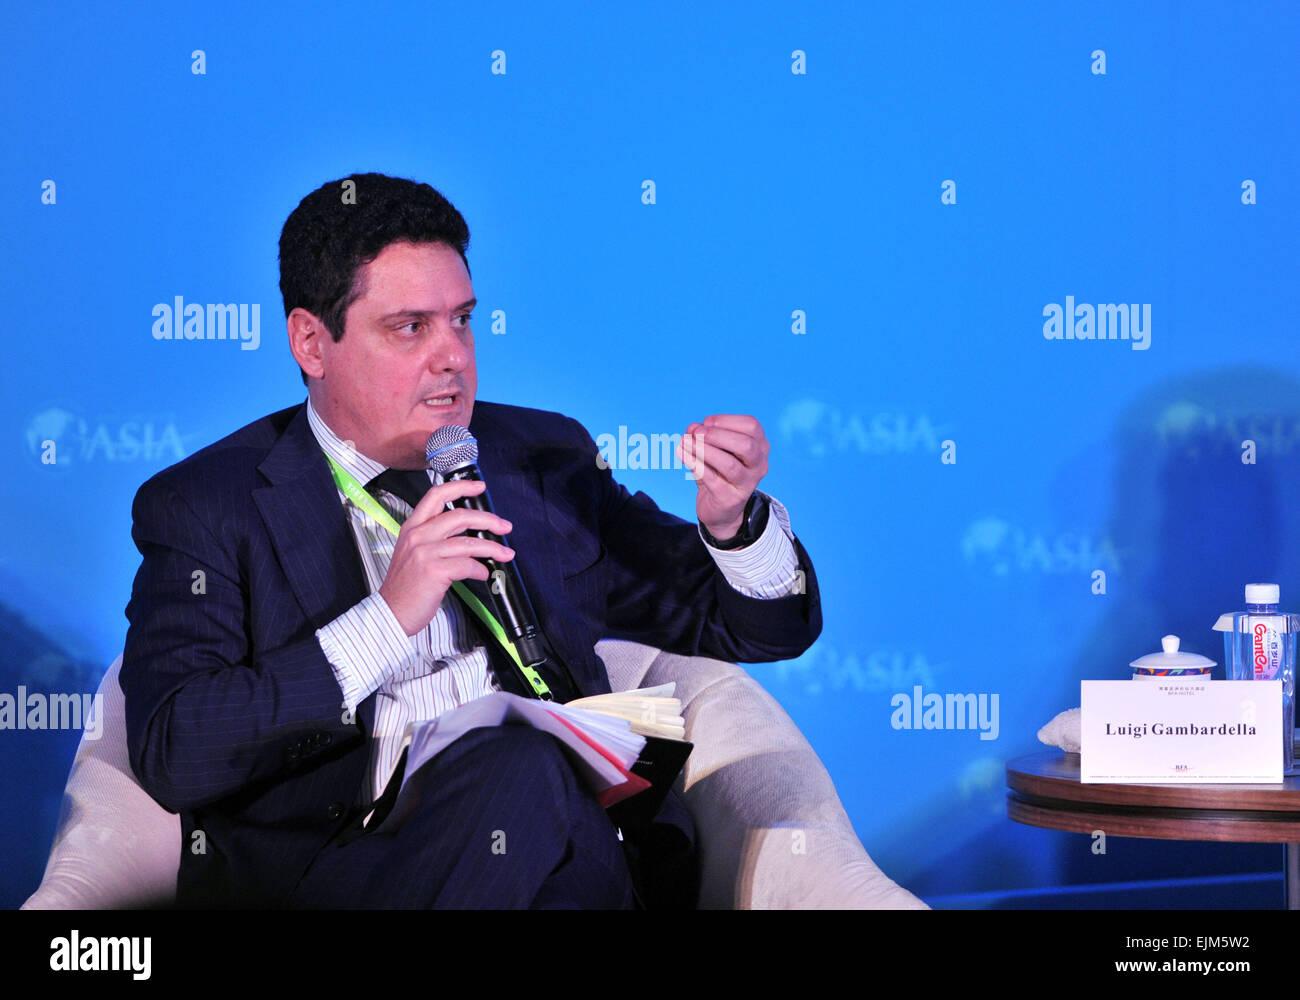 Boao, China's Hainan Province. 29th Mar, 2015. Luigi Gambardella, founder and president of ChinaEU, speaks at - Stock Image